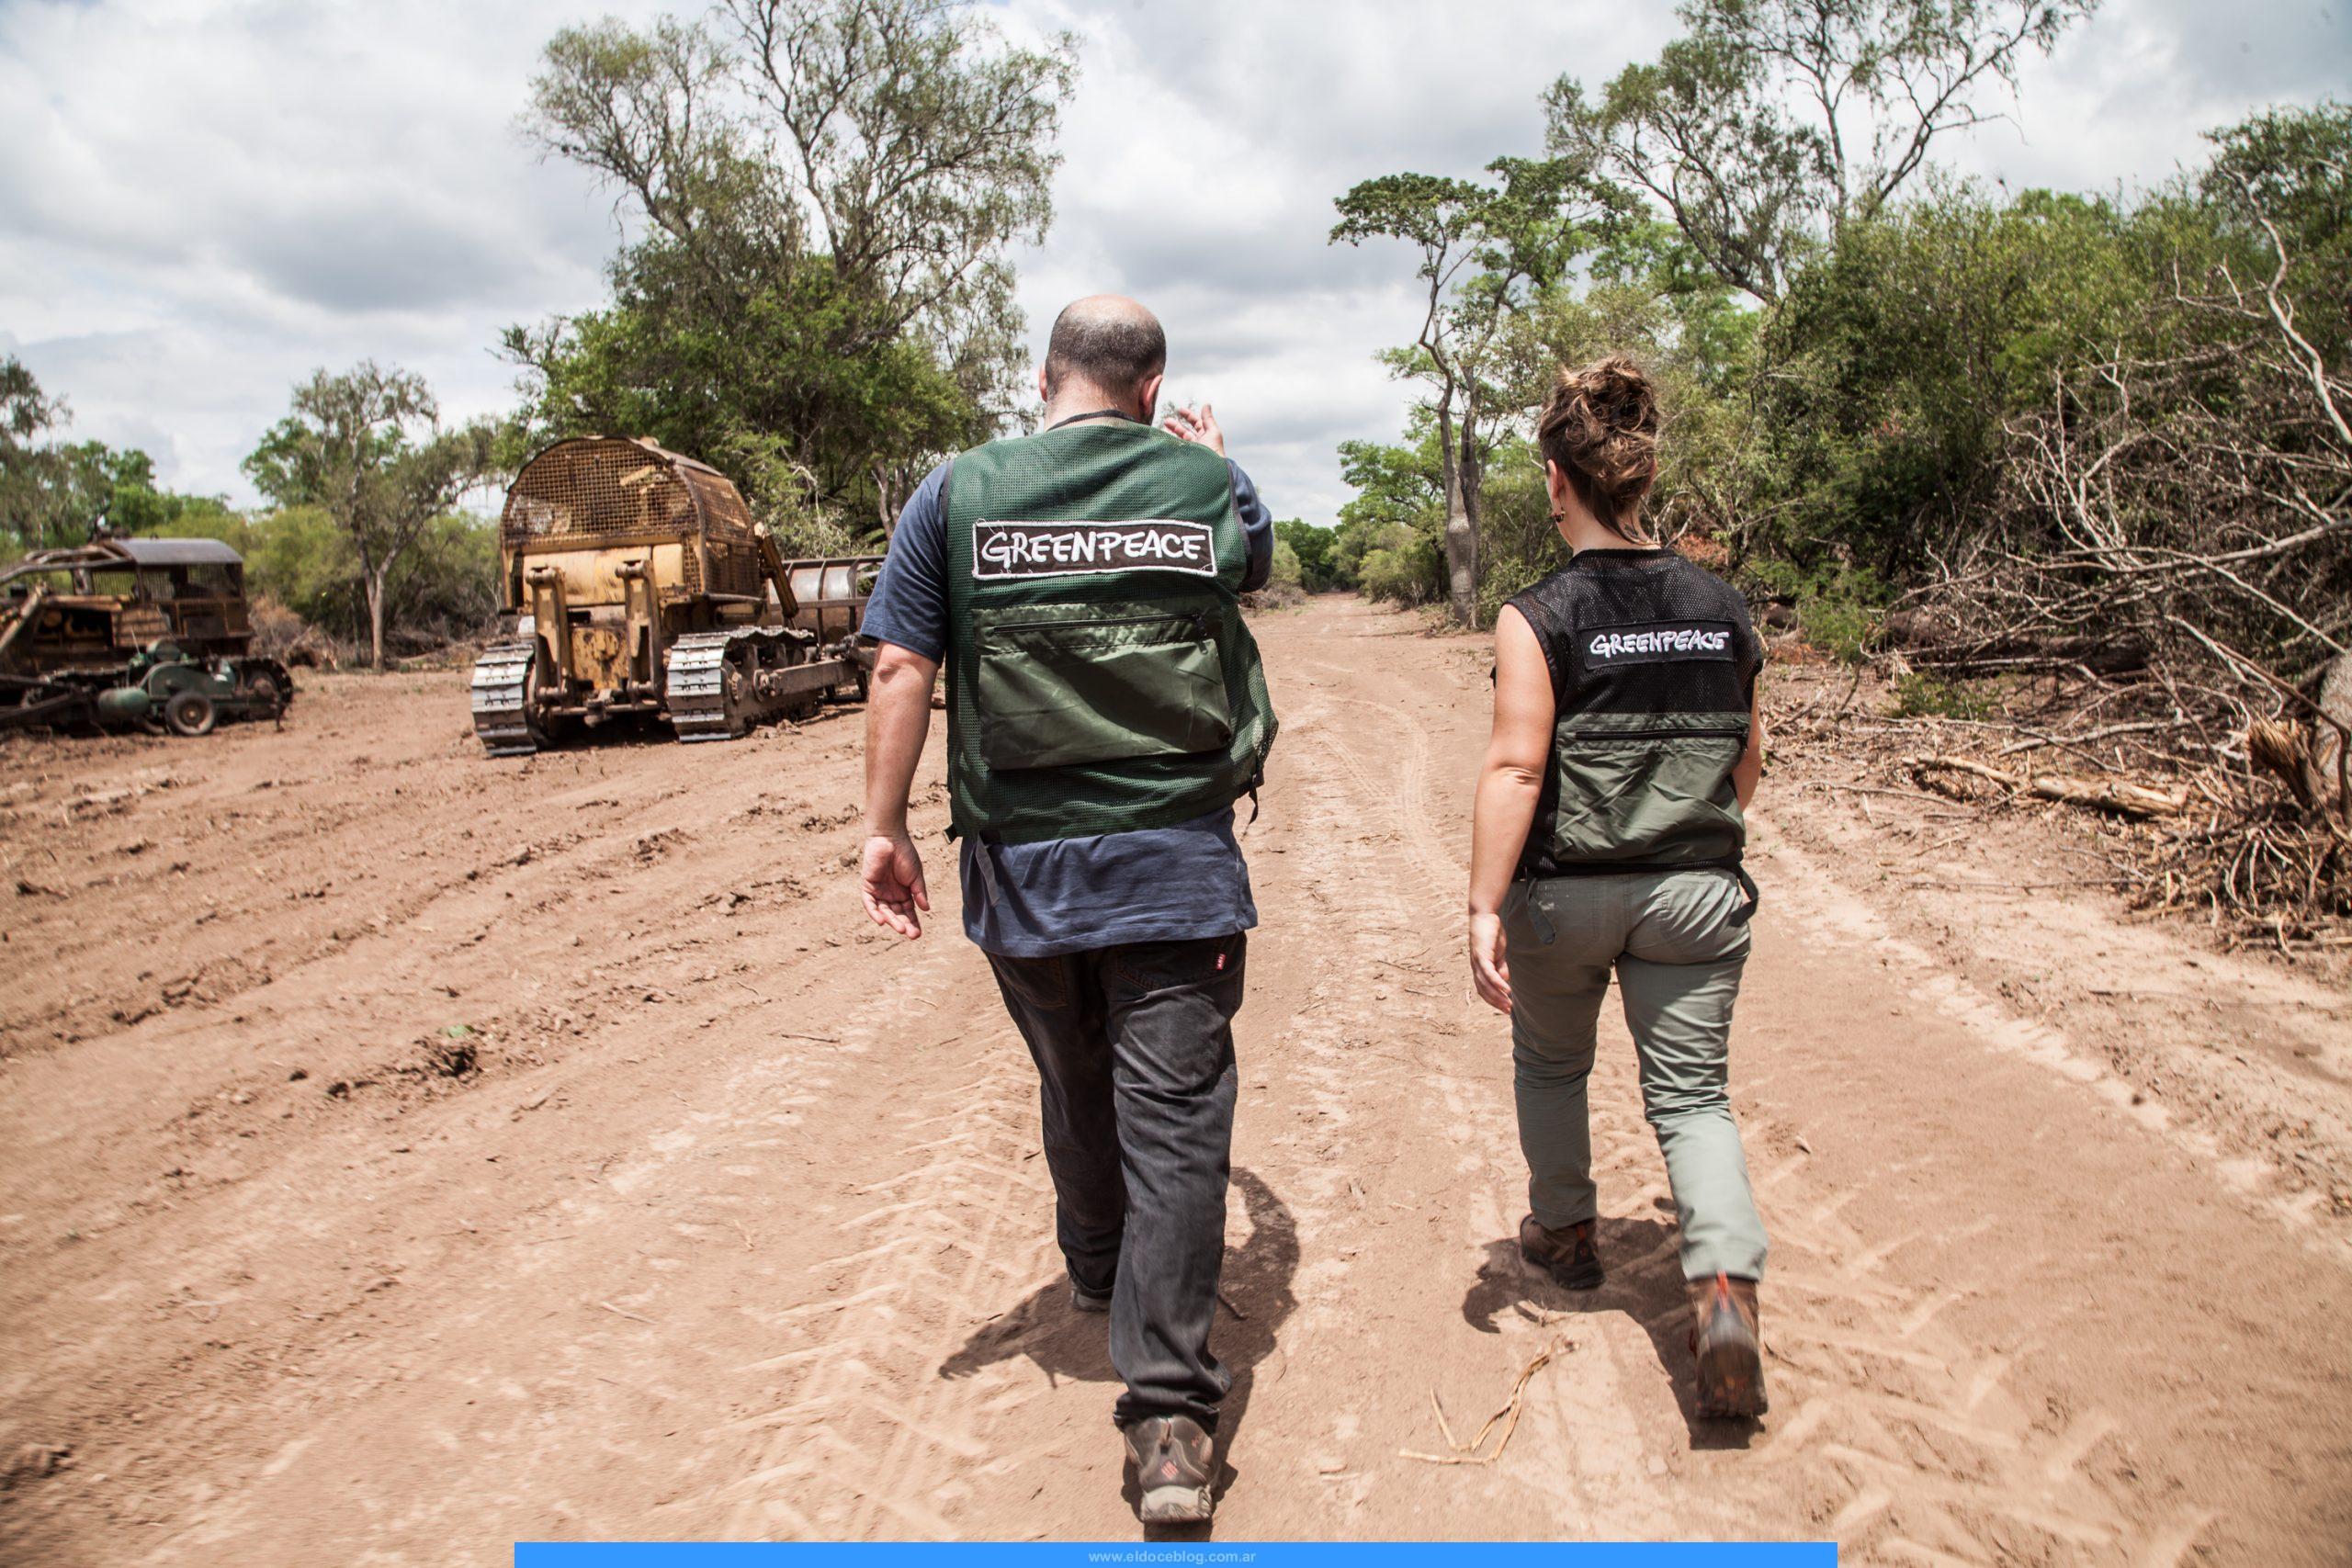 Como Dar de Baja Aporte a Greenpeace Argentina